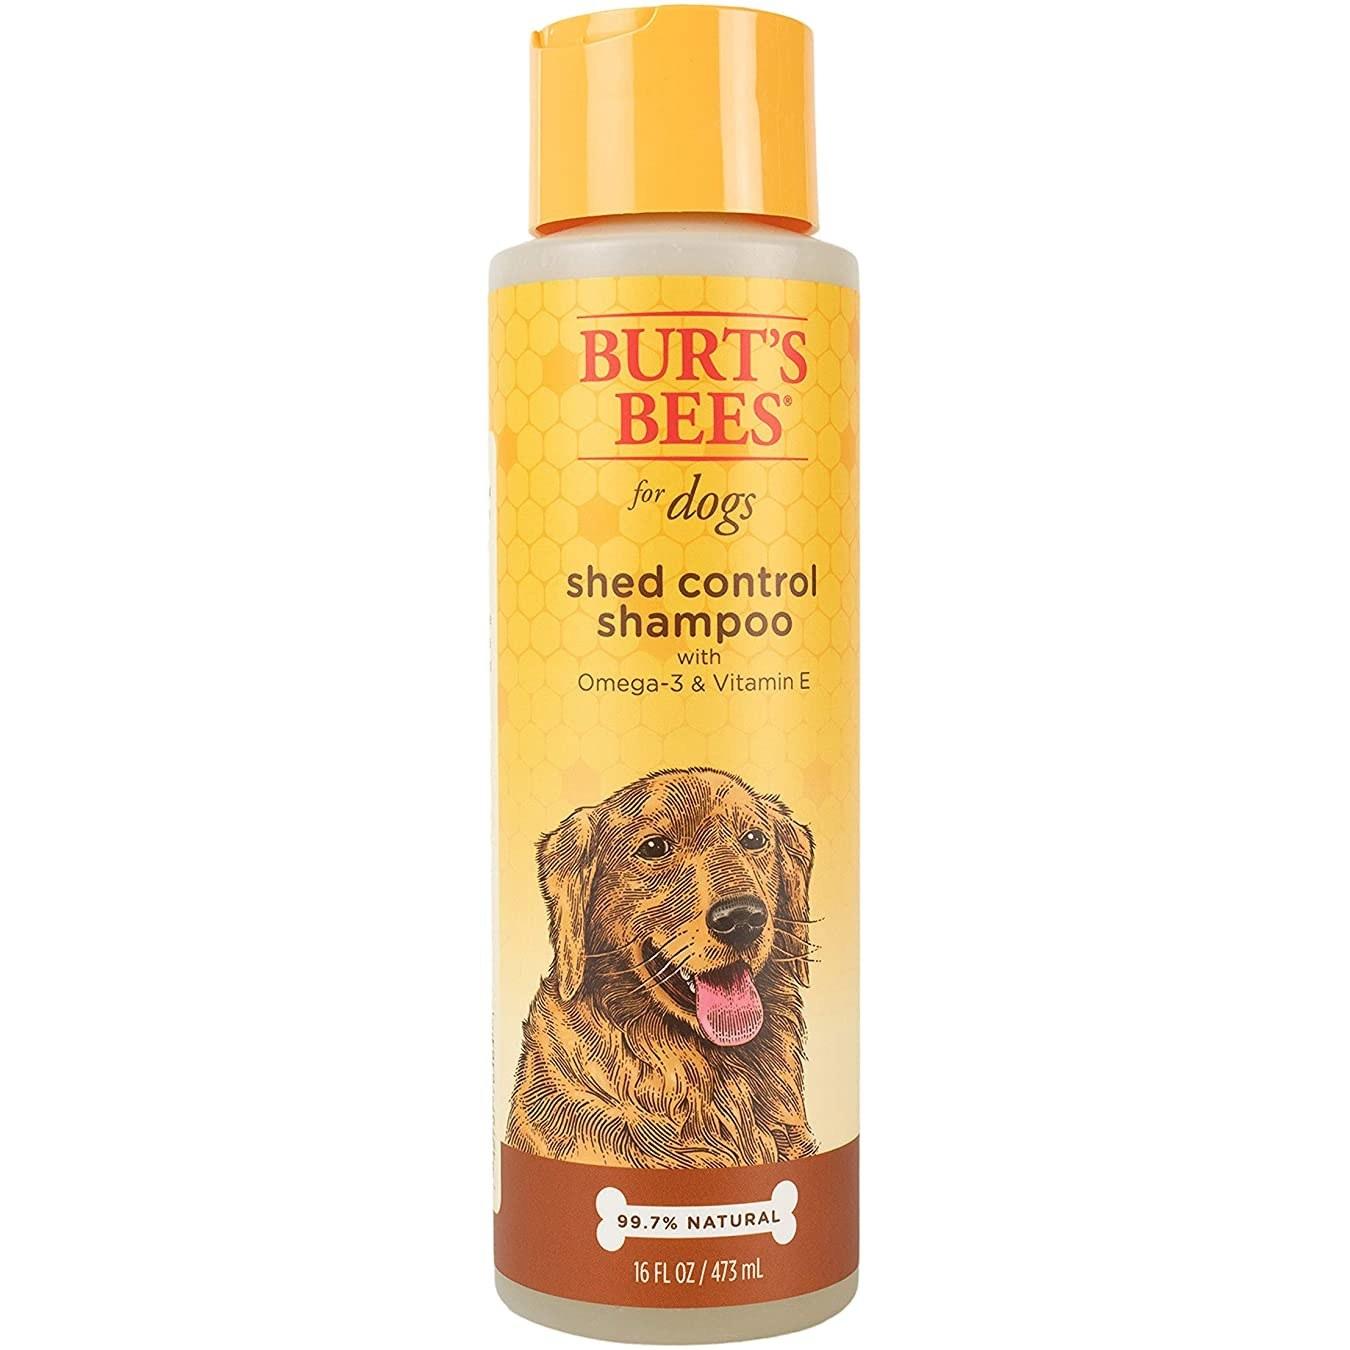 The shampoo bottle